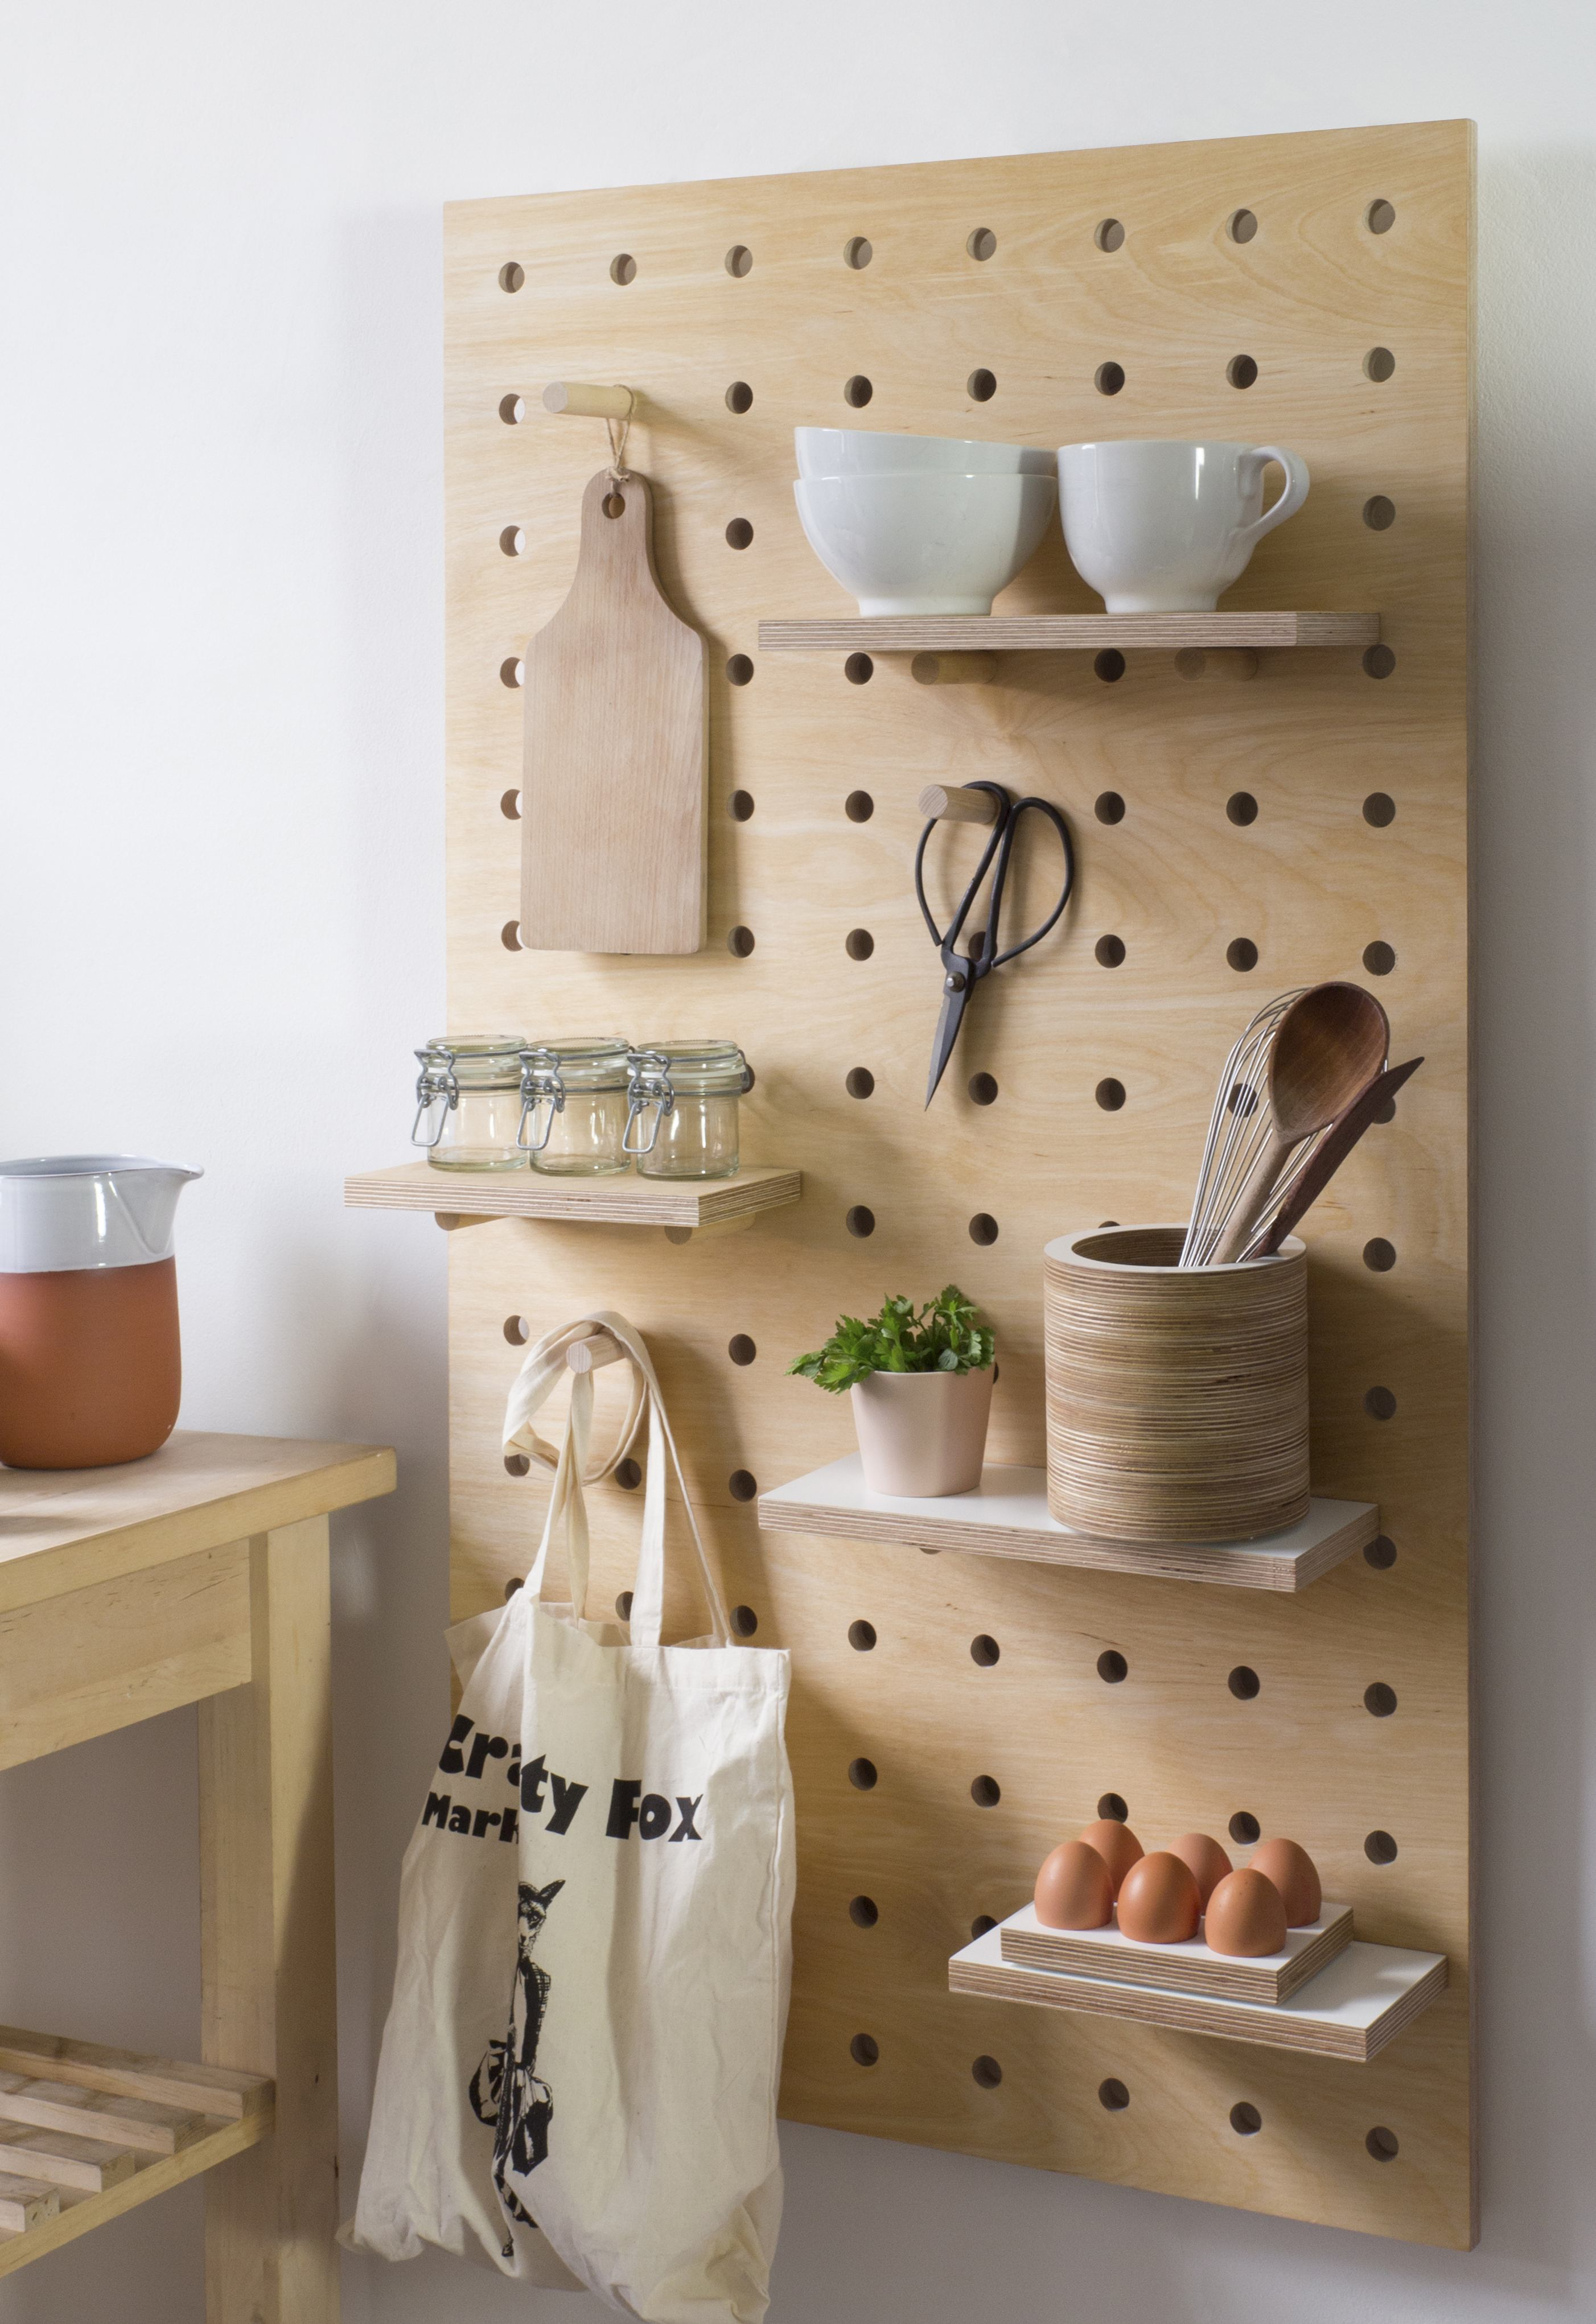 Designer Nikki Kreis Of Kreisdesign Created A Sturdier, Slightly Chunkier  Riff On The Fail Safe Kitchen Pegboard Using Thicker Cuts Of Plywood, ...